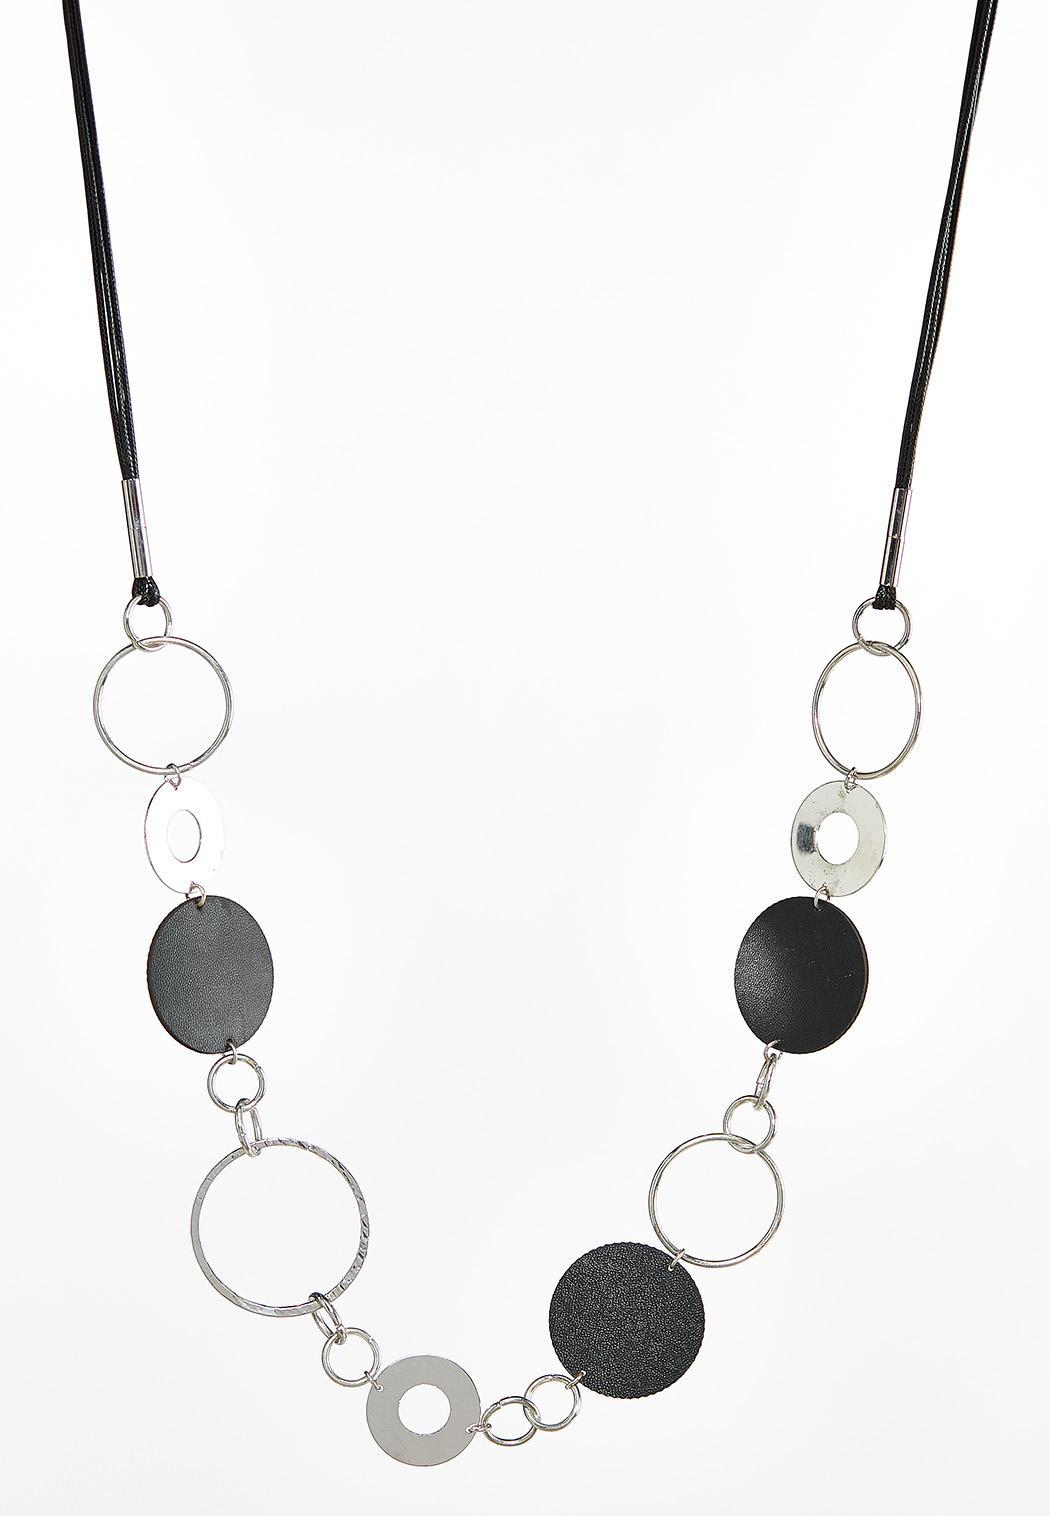 Mod Circle Cord Necklace